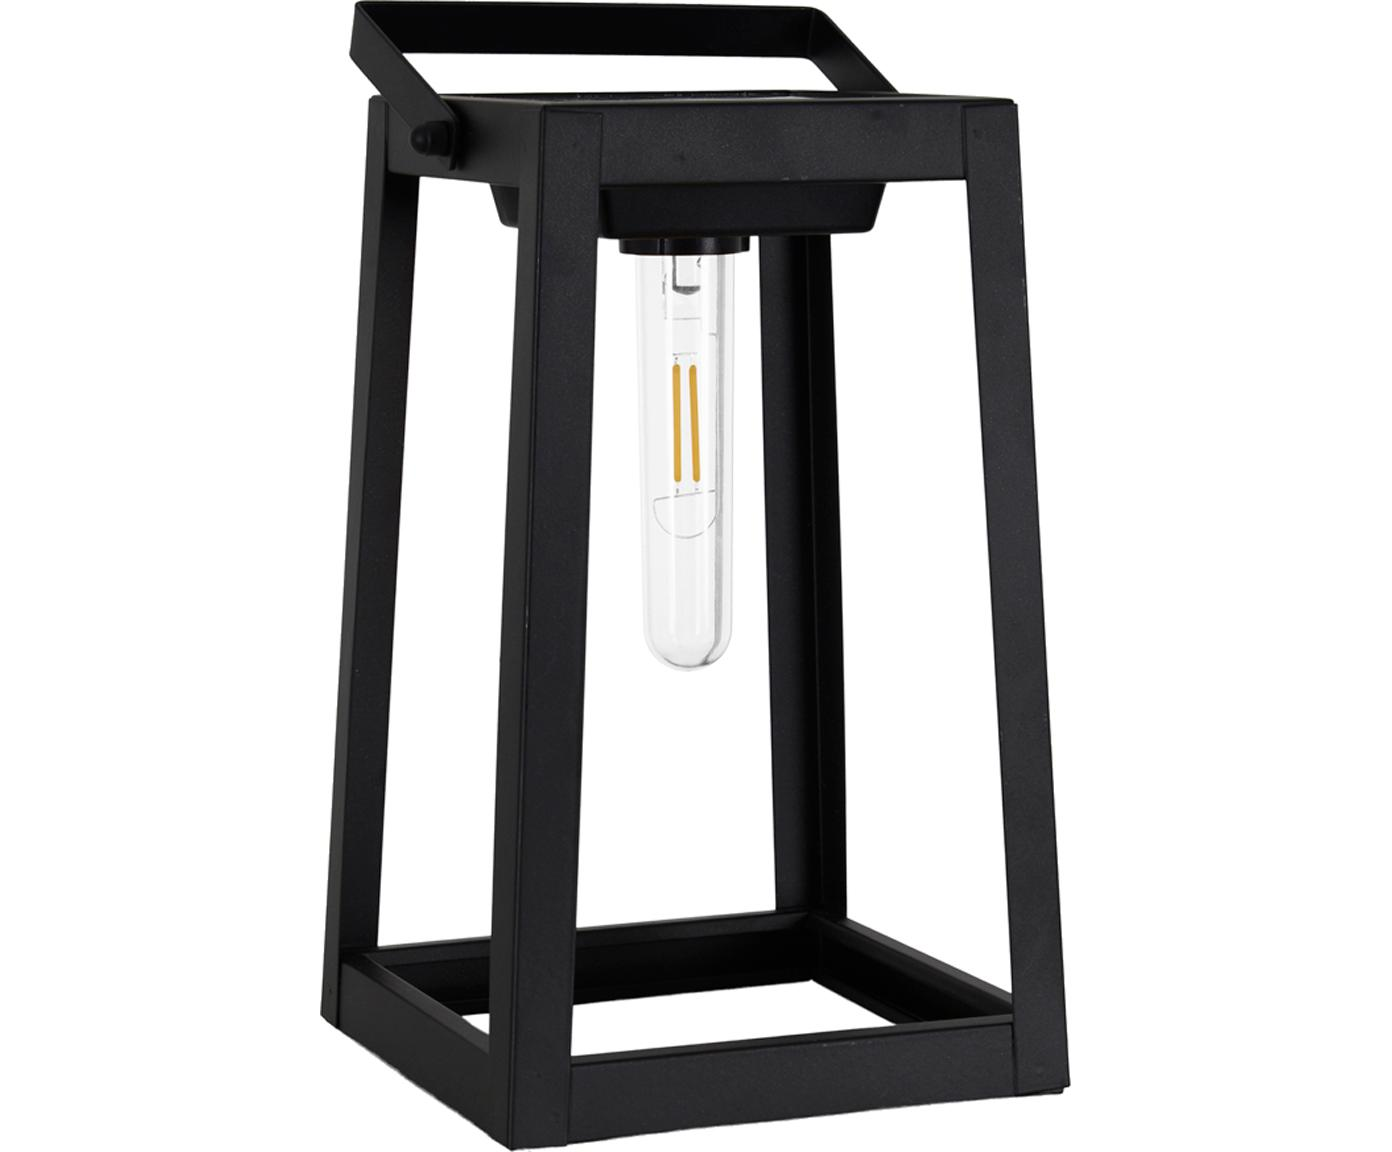 LED Solarleuchte Tippy, Metall, Kunststoff, Schwarz, 15 x 31 cm